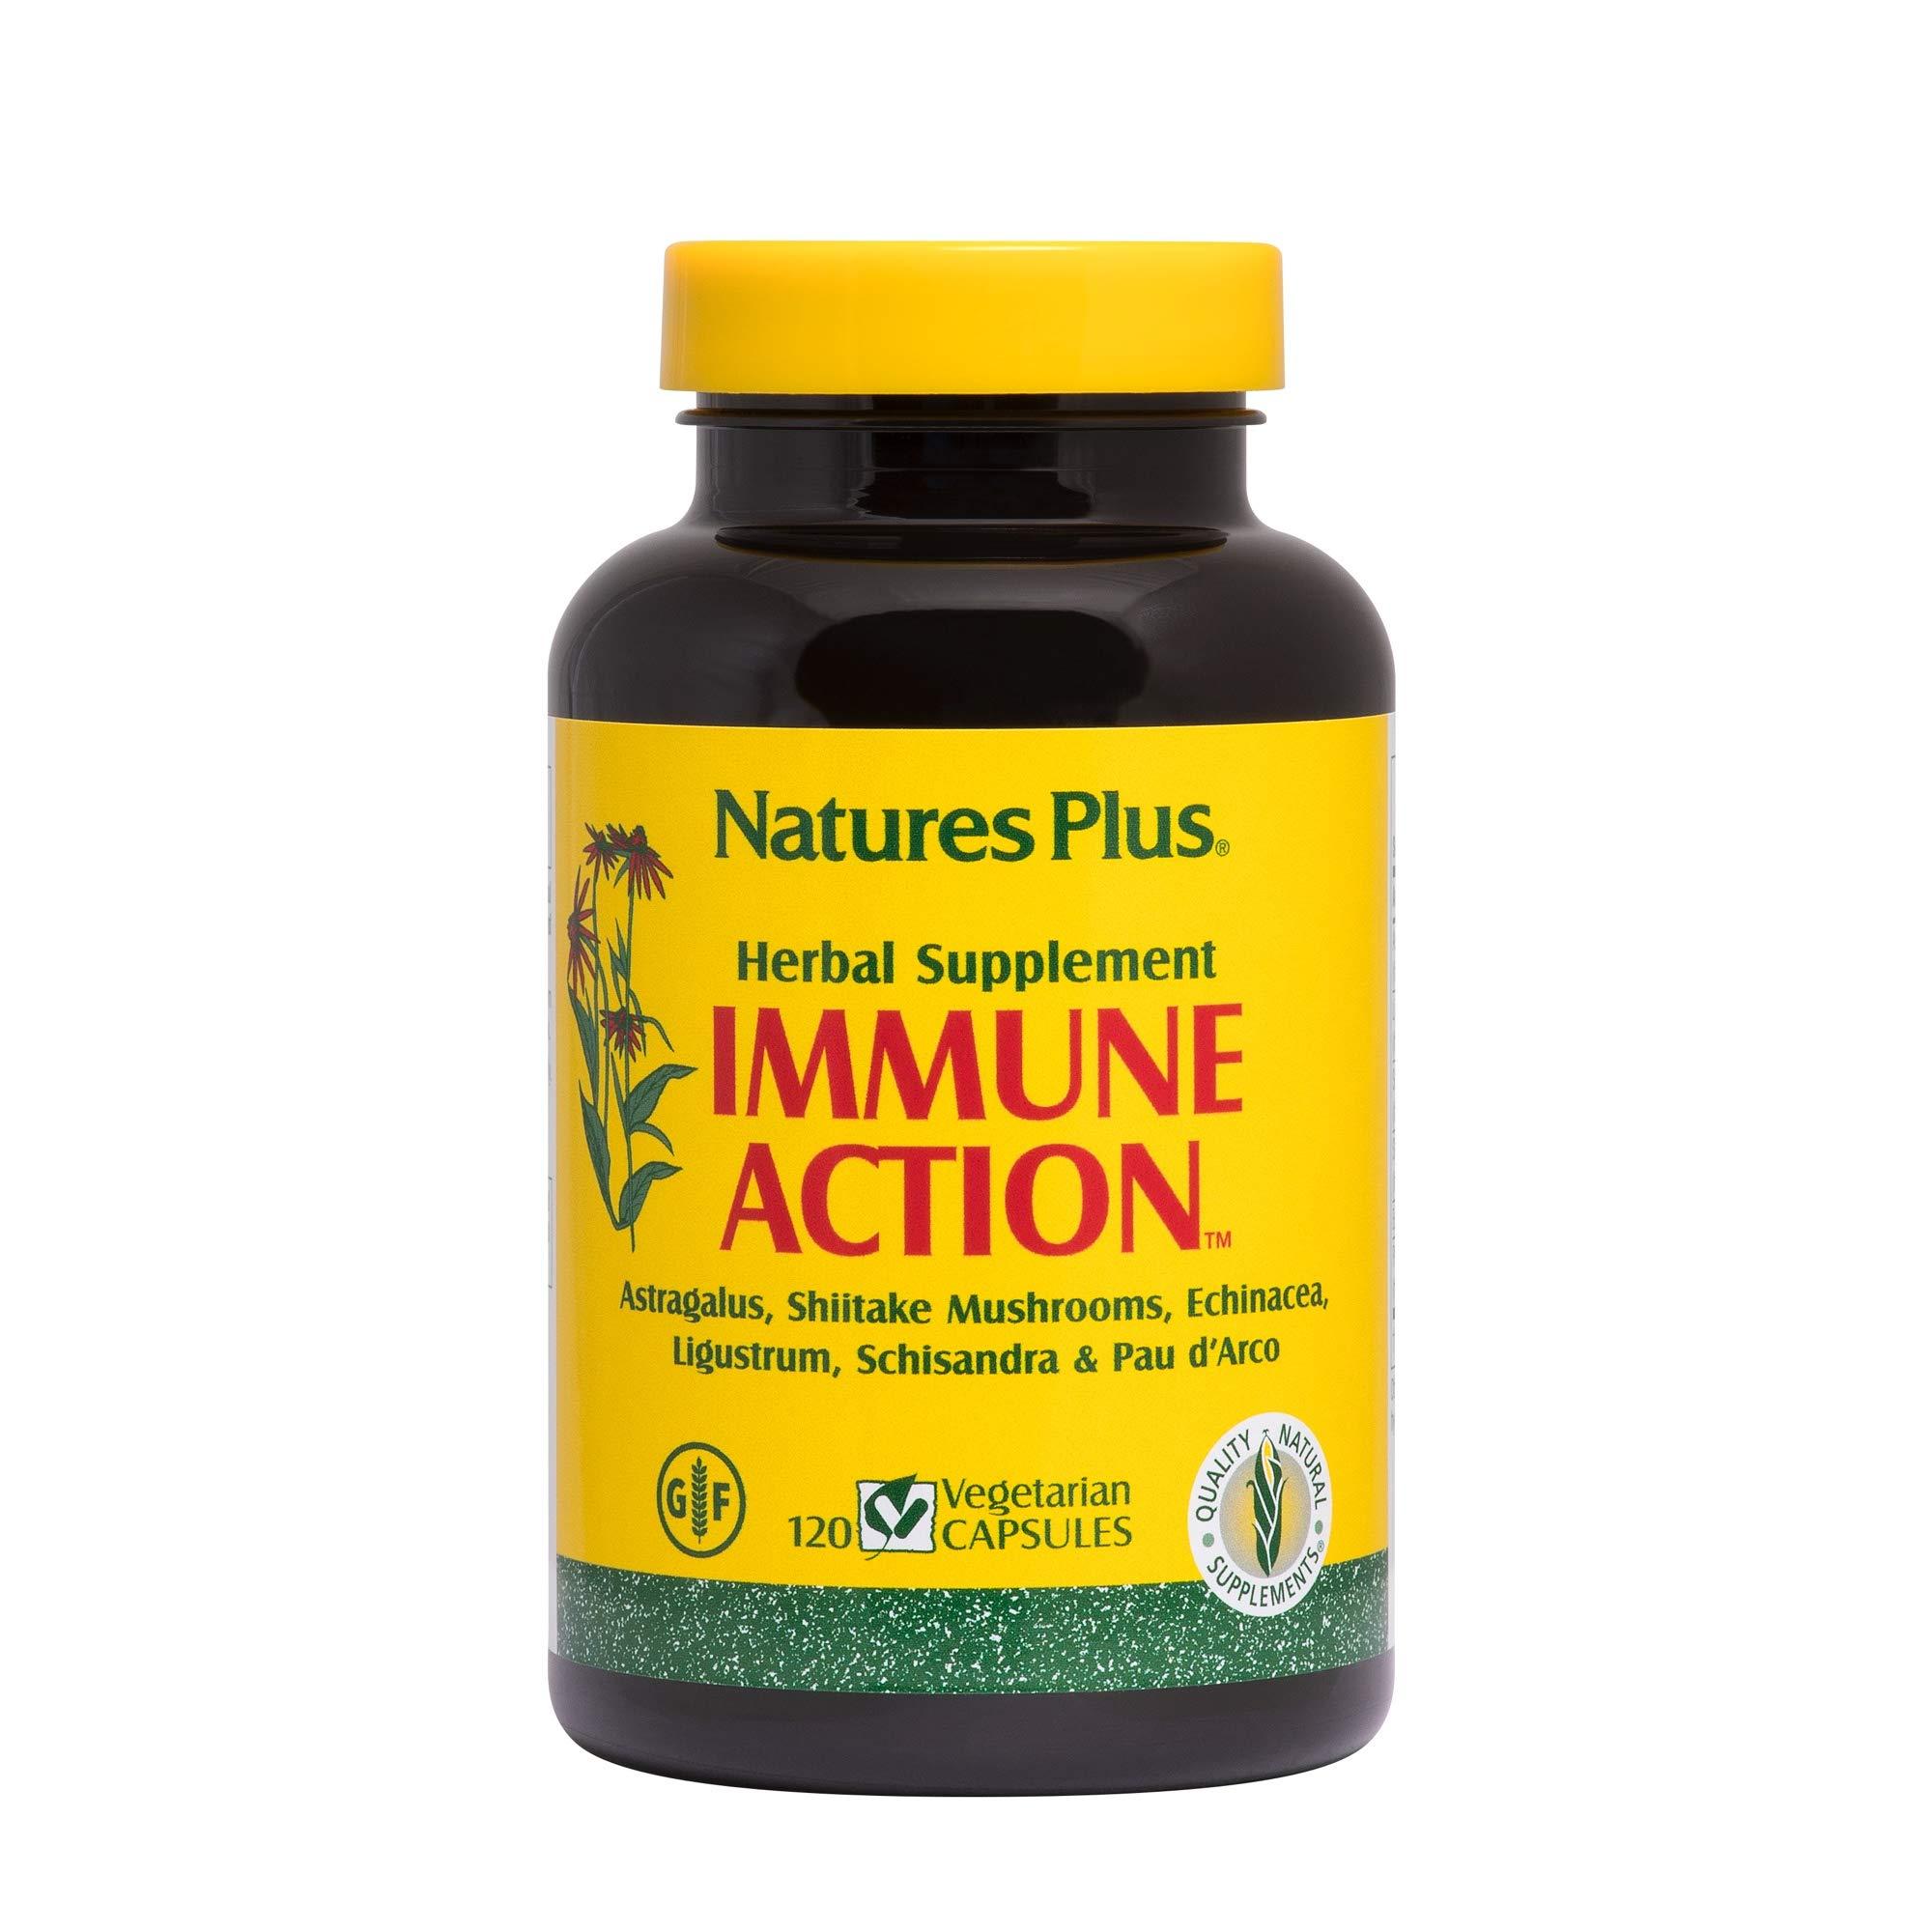 NaturesPlus Immune Action - 120 Vegetarian Capsules - Powerful Ancient Herbal Blend - Immune System Support Supplement - Vegan, Gluten-Free - 120 Servings